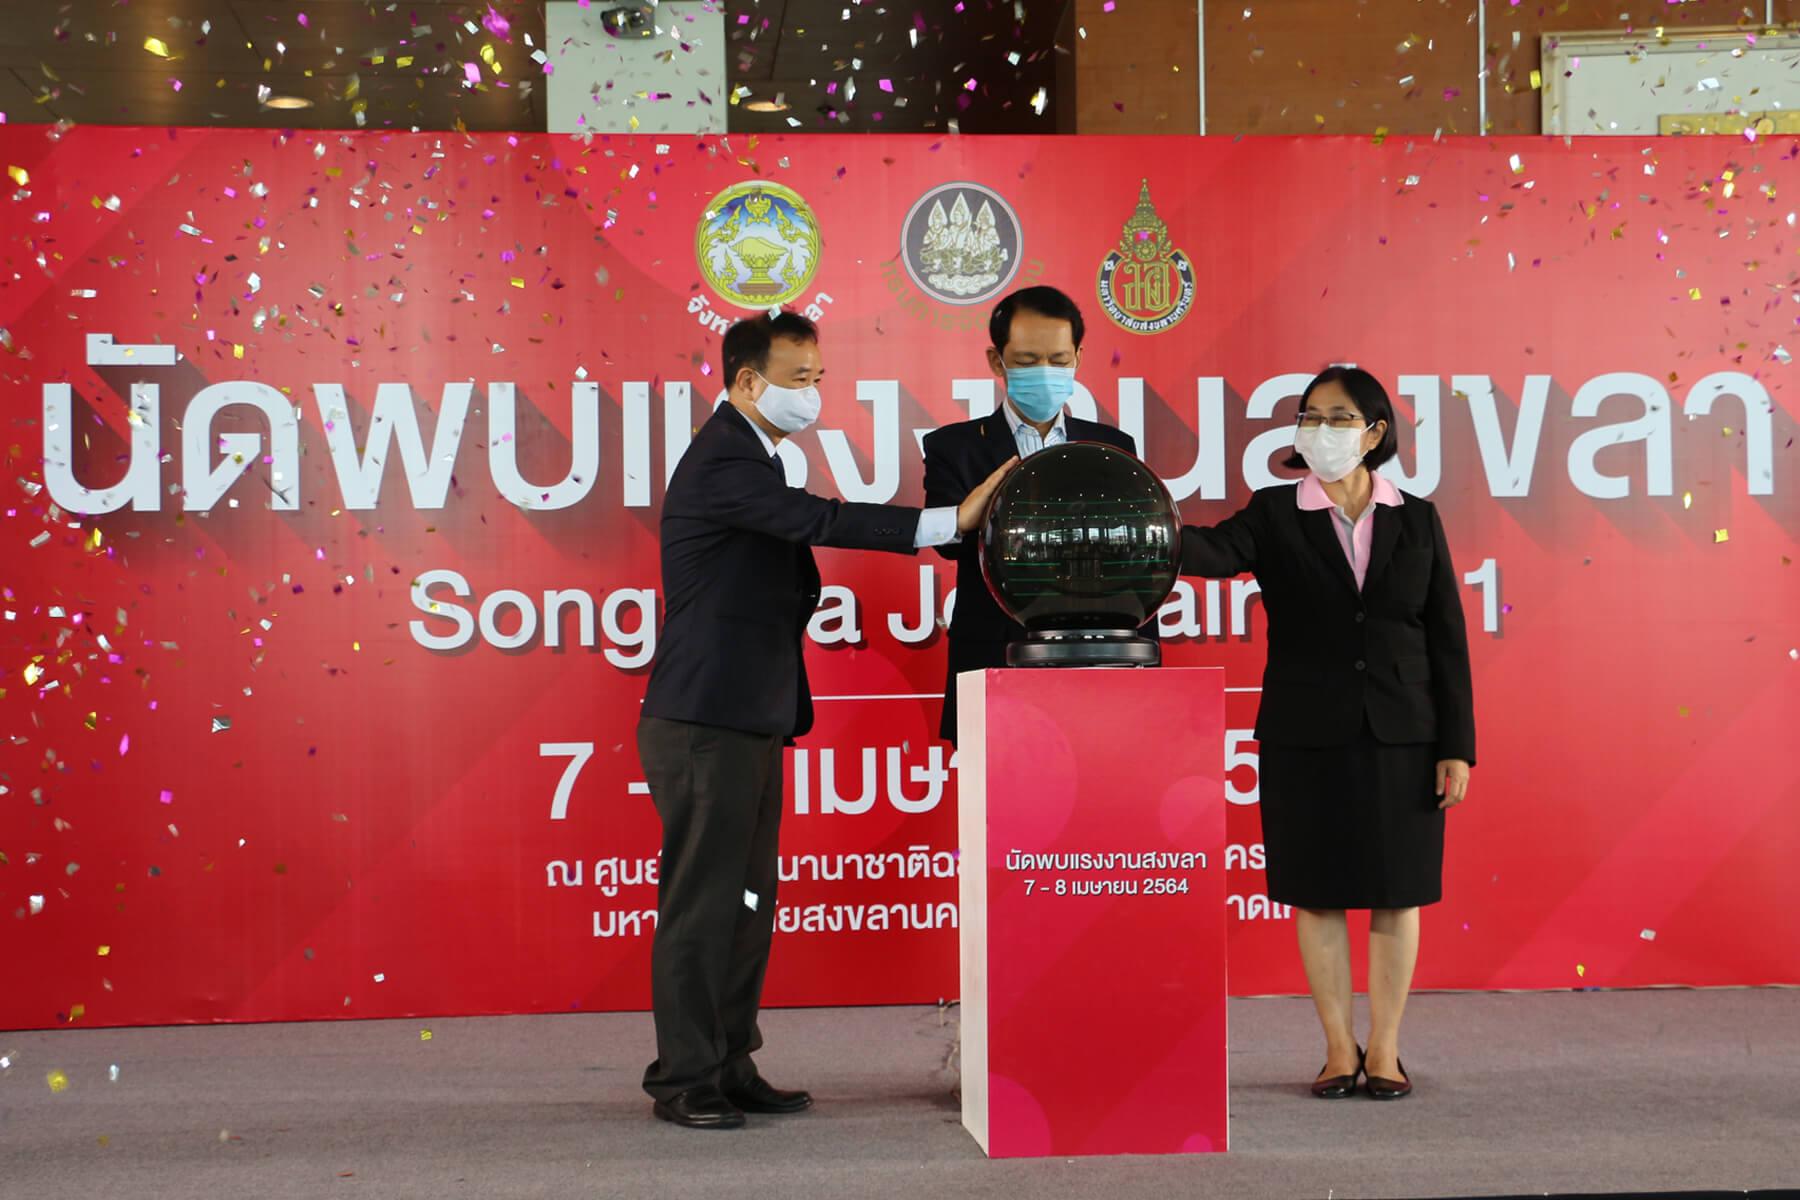 2564 ICC HATYAI ศูนย์ประชุมนานาชาติฉลองสิริราชสมบัติครบ ๖๐ ปี